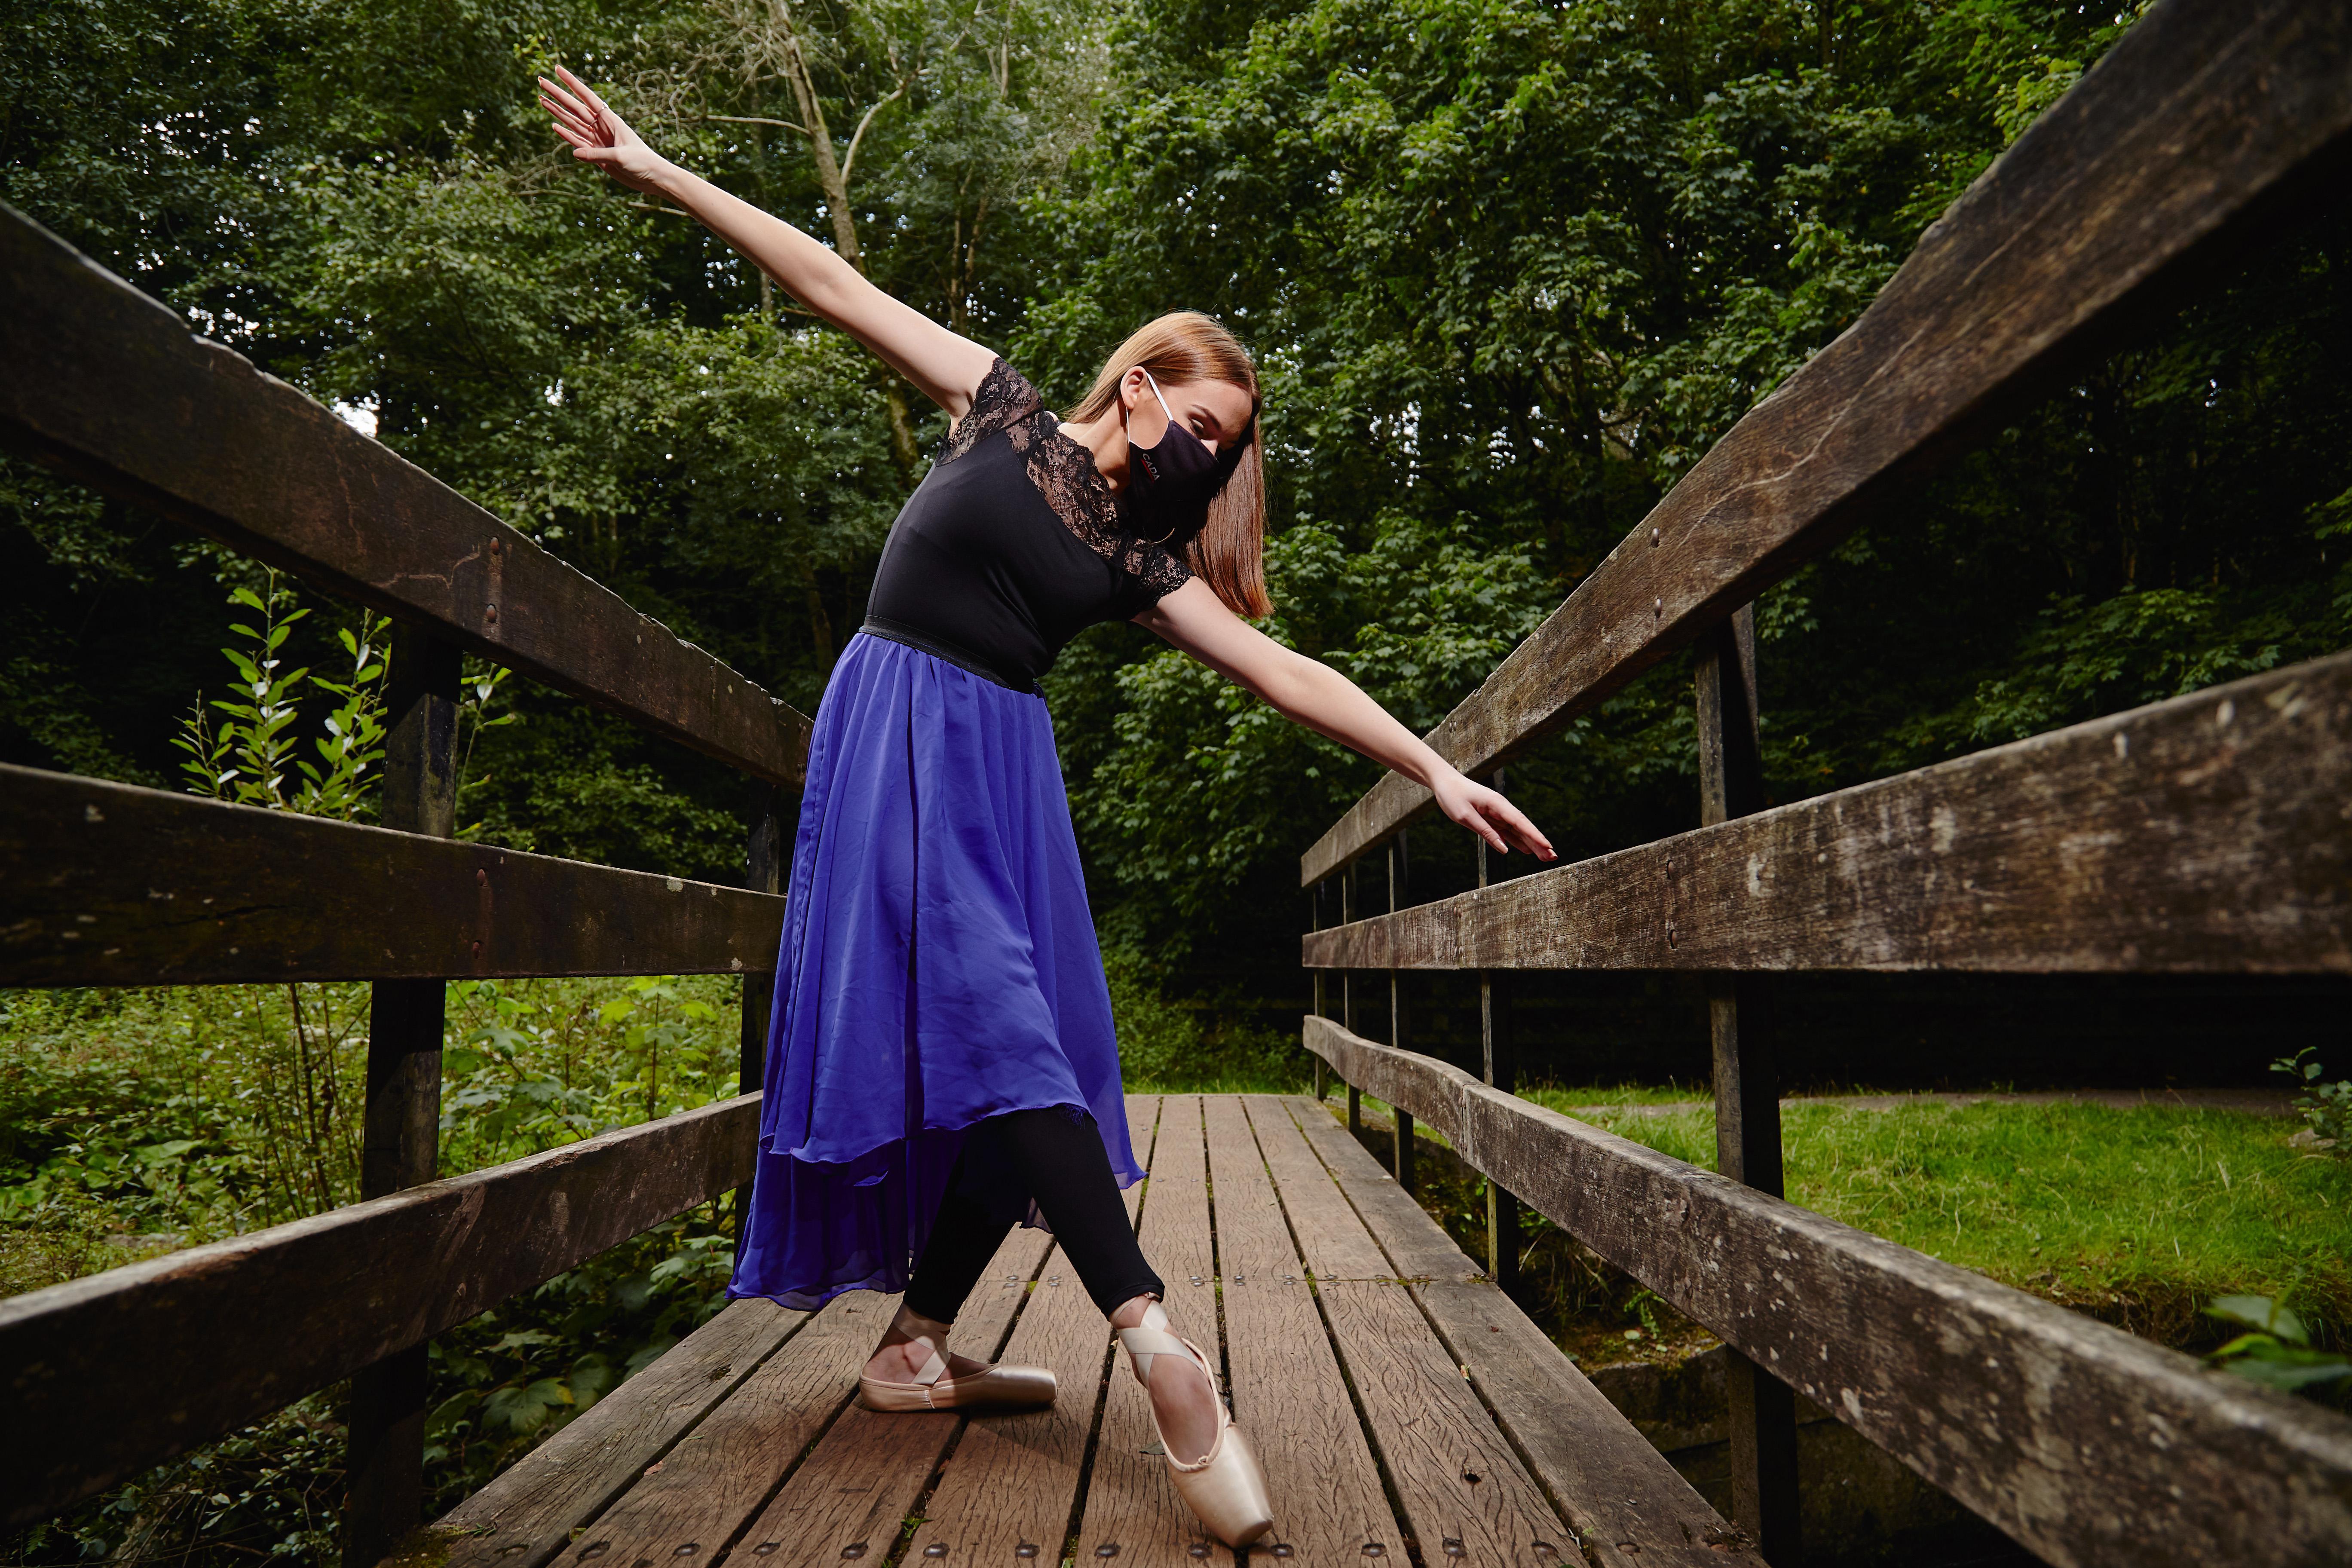 CADA Performing Arts Picture: Miki Barlok